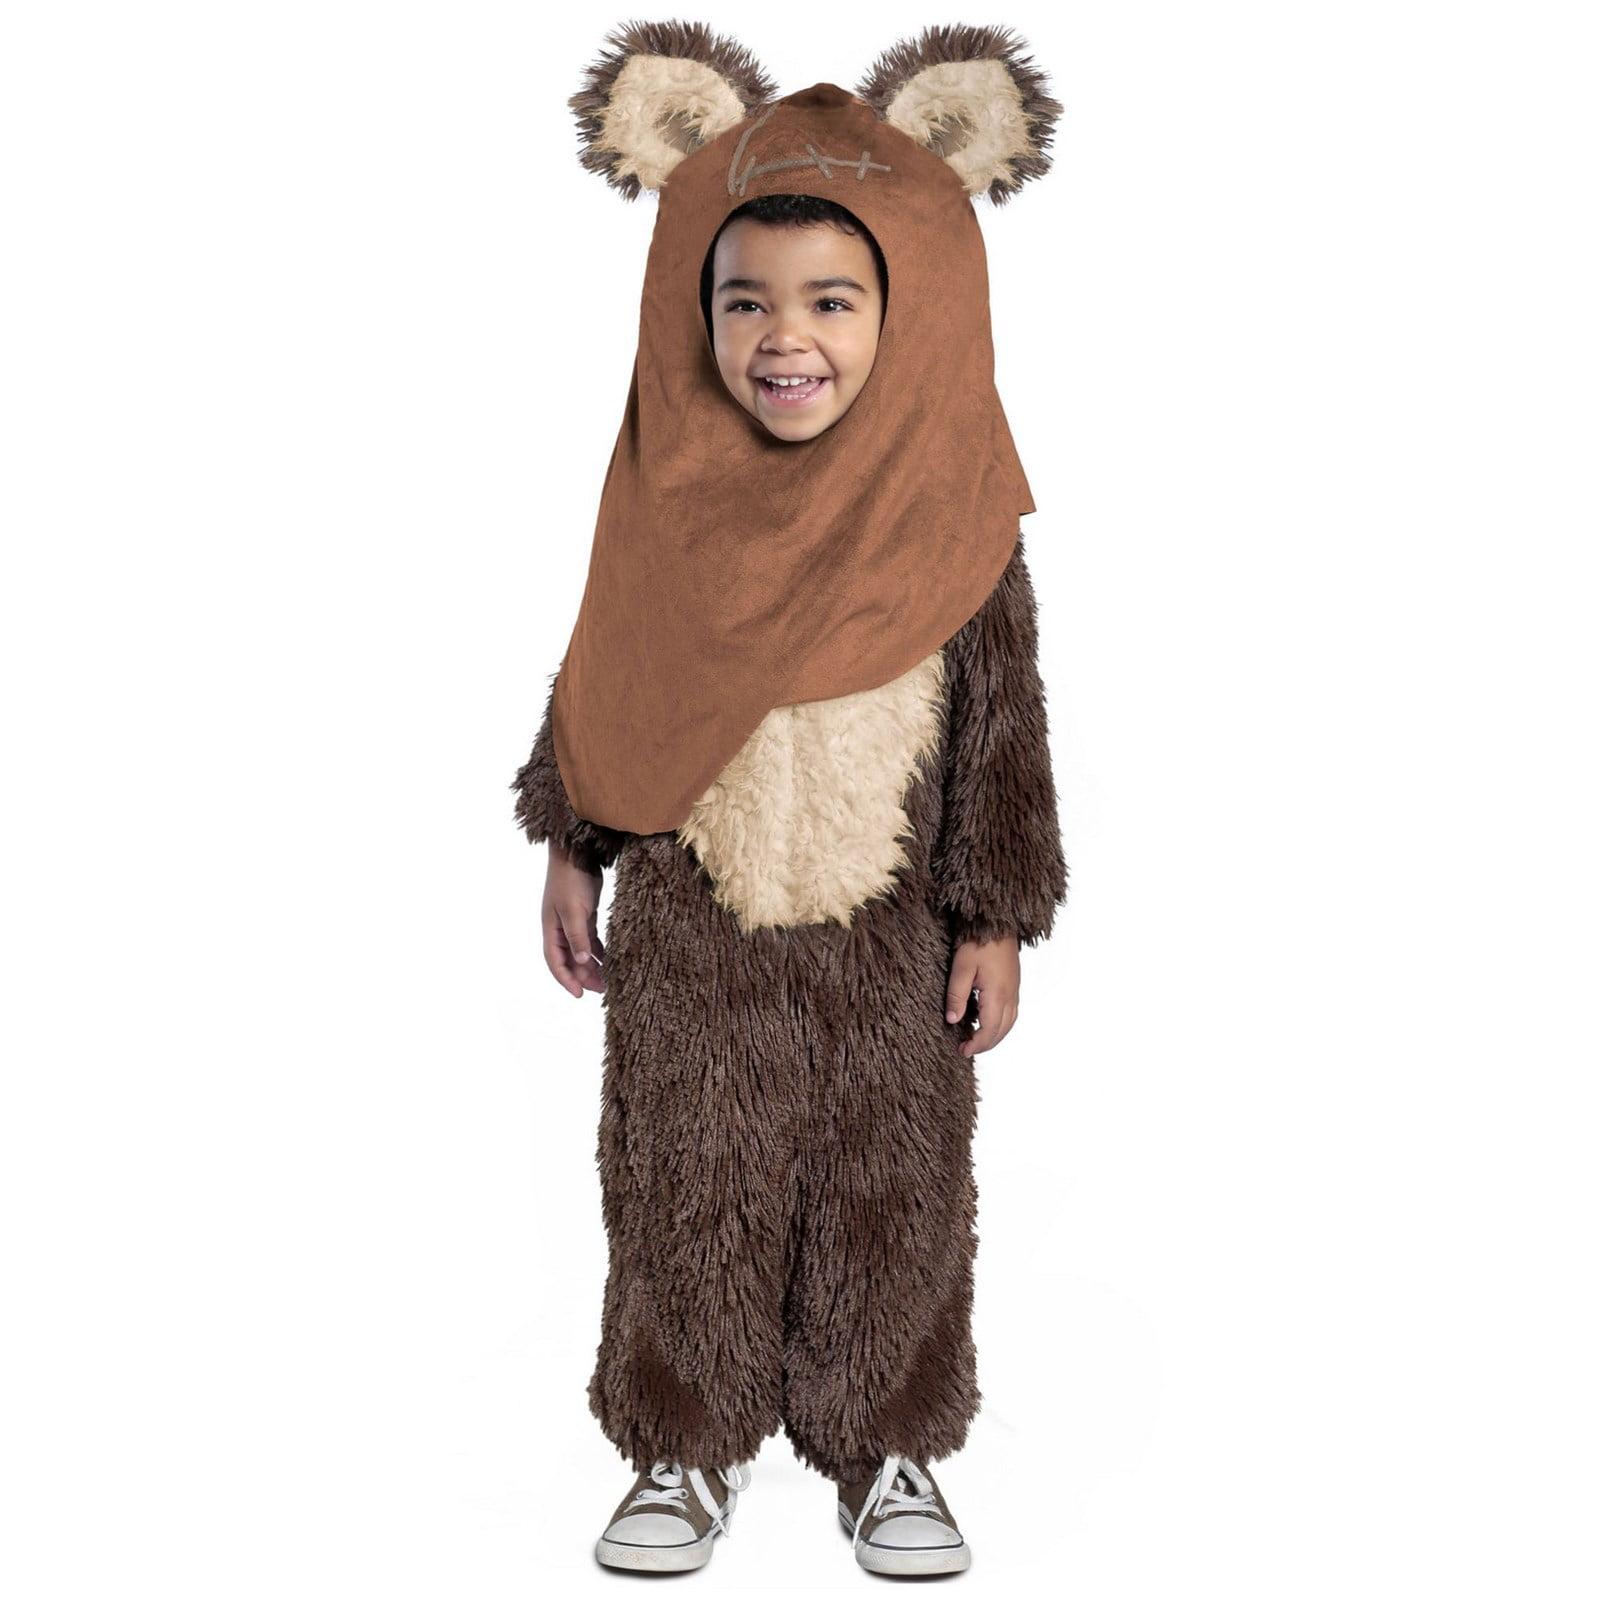 Classic Star Wars Premium Toddler Wicket Halloween Costume